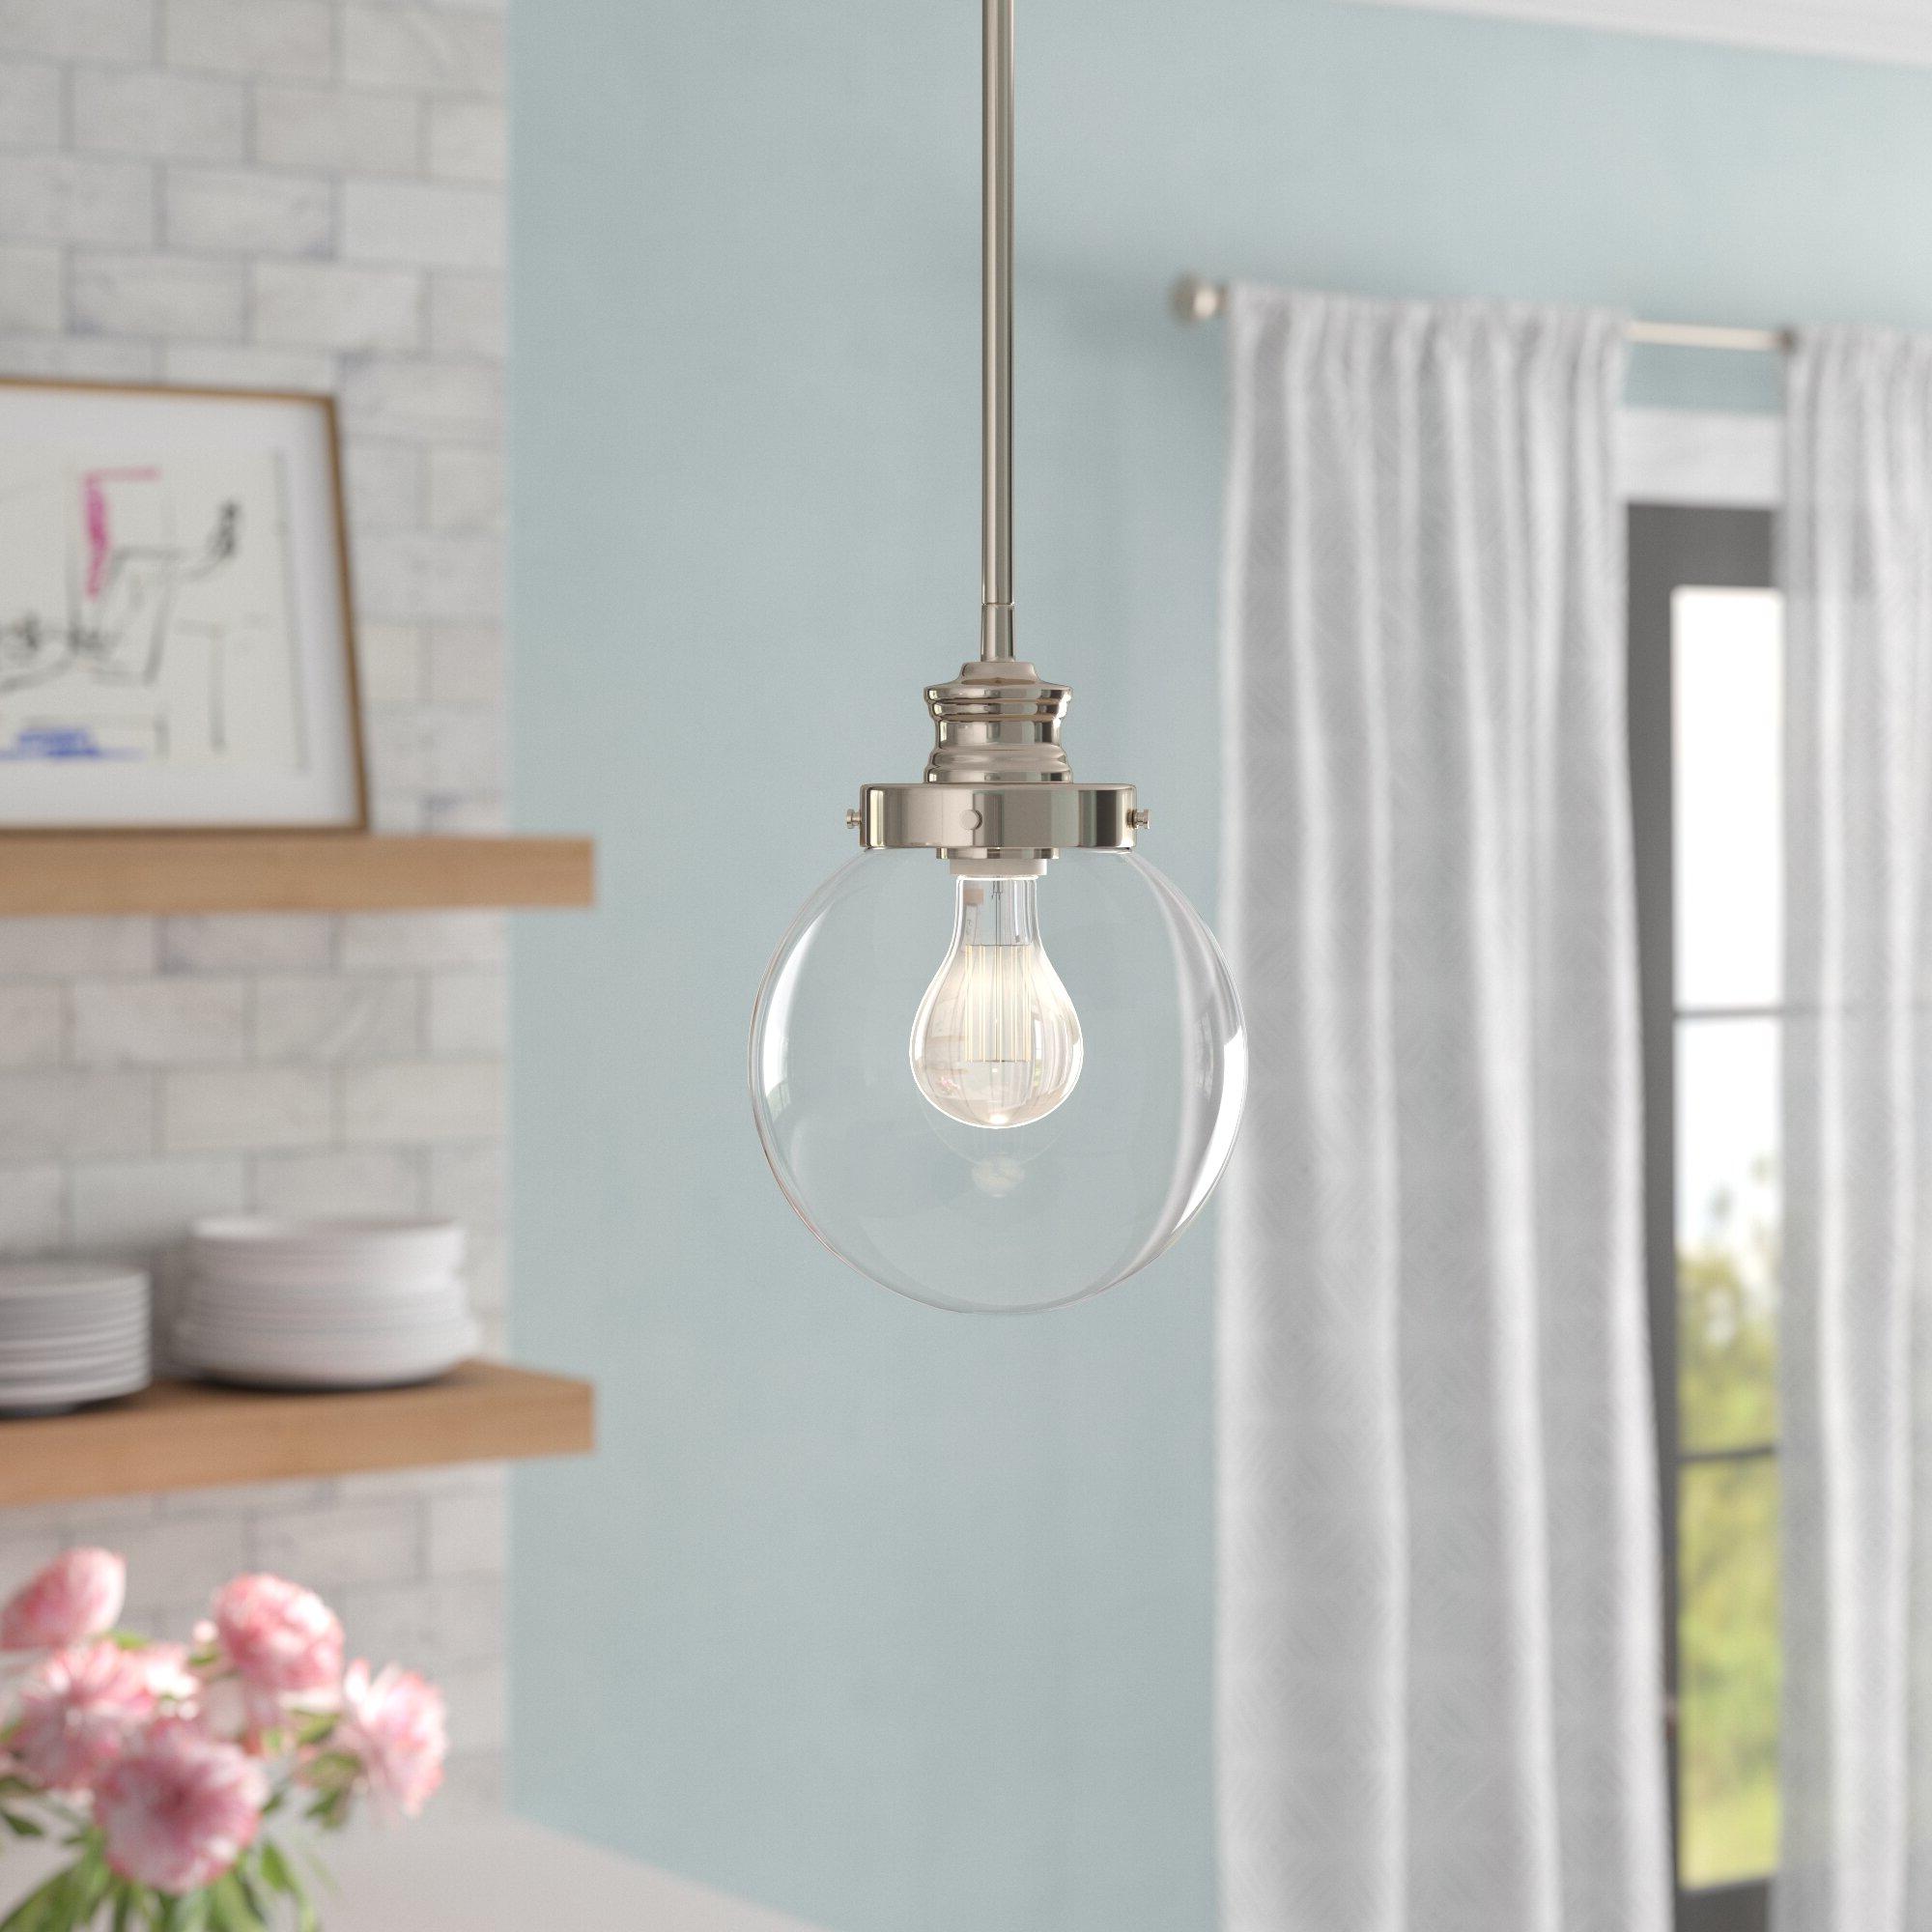 Cayden 1 Light Single Globe Pendant Within Popular Bautista 1 Light Single Globe Pendants (View 11 of 20)